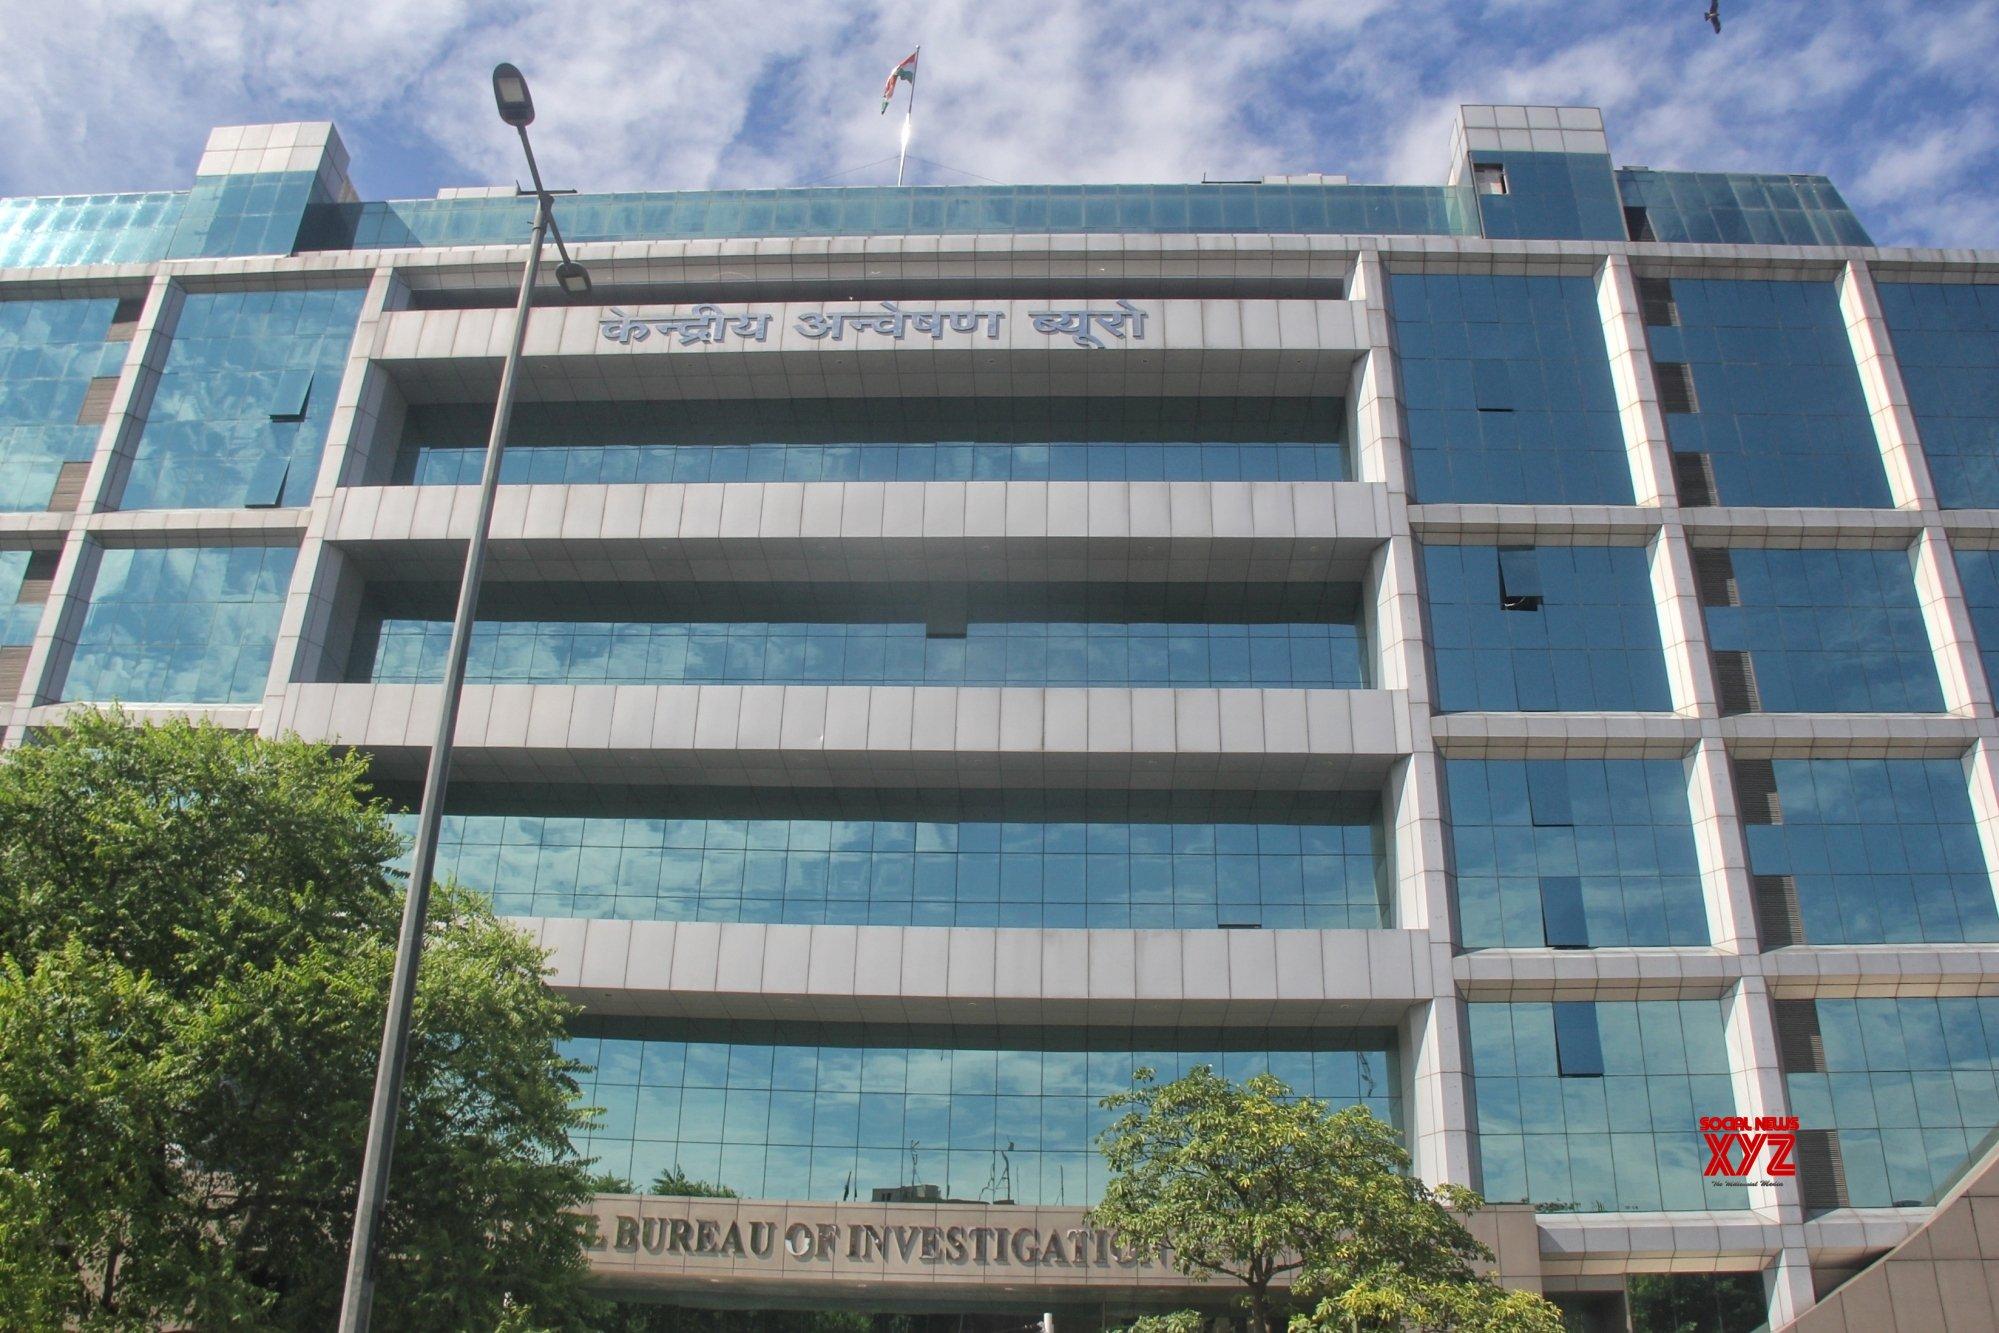 : CBI Headquarter at CGO complex in new Delhi on Wednesday September 15, 2021 #Gallery